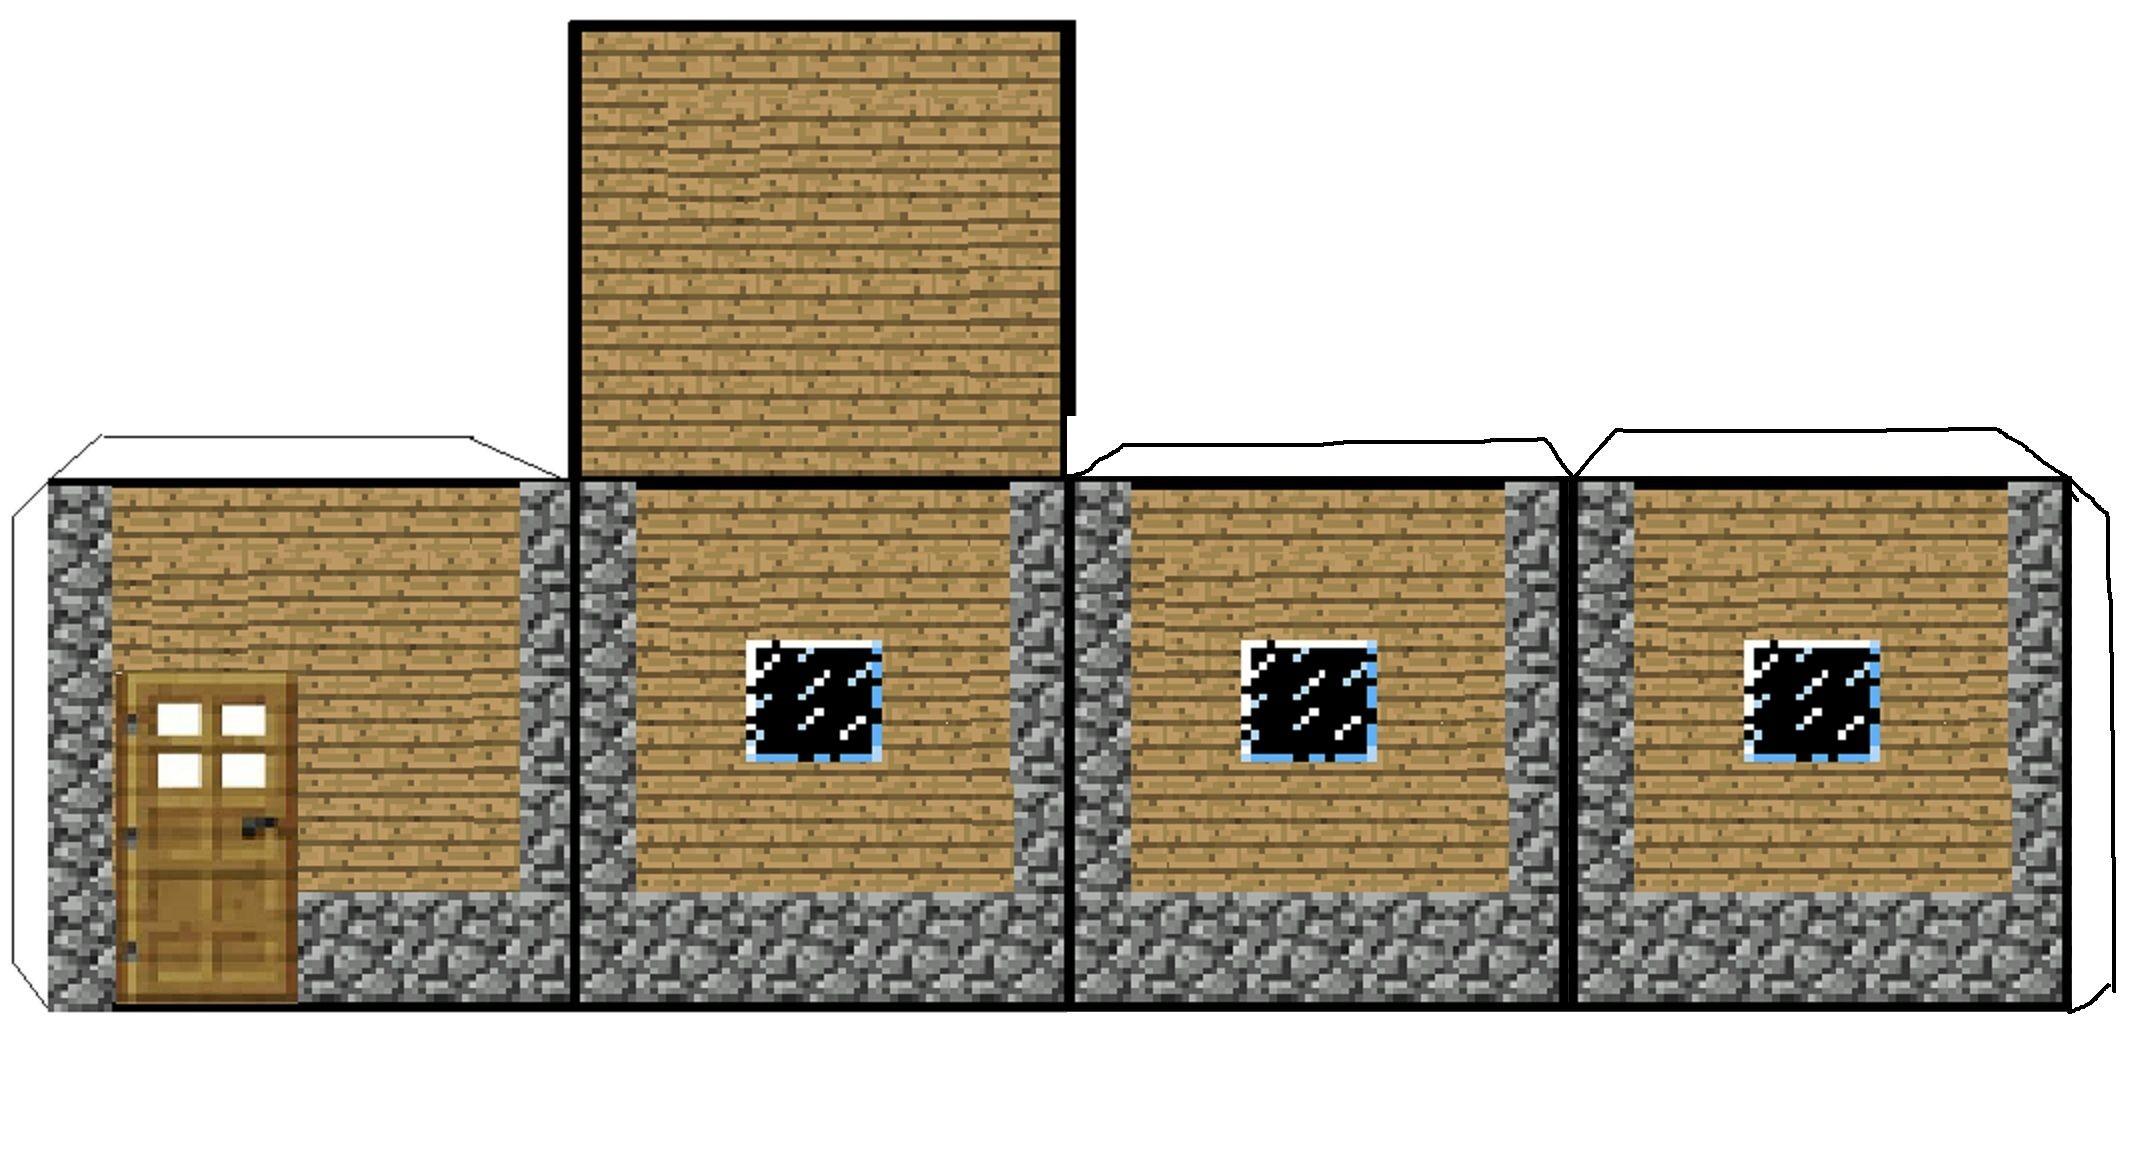 Minecraft Papercraft House Mindcraft Paper Craft Craft Decoration Ideas